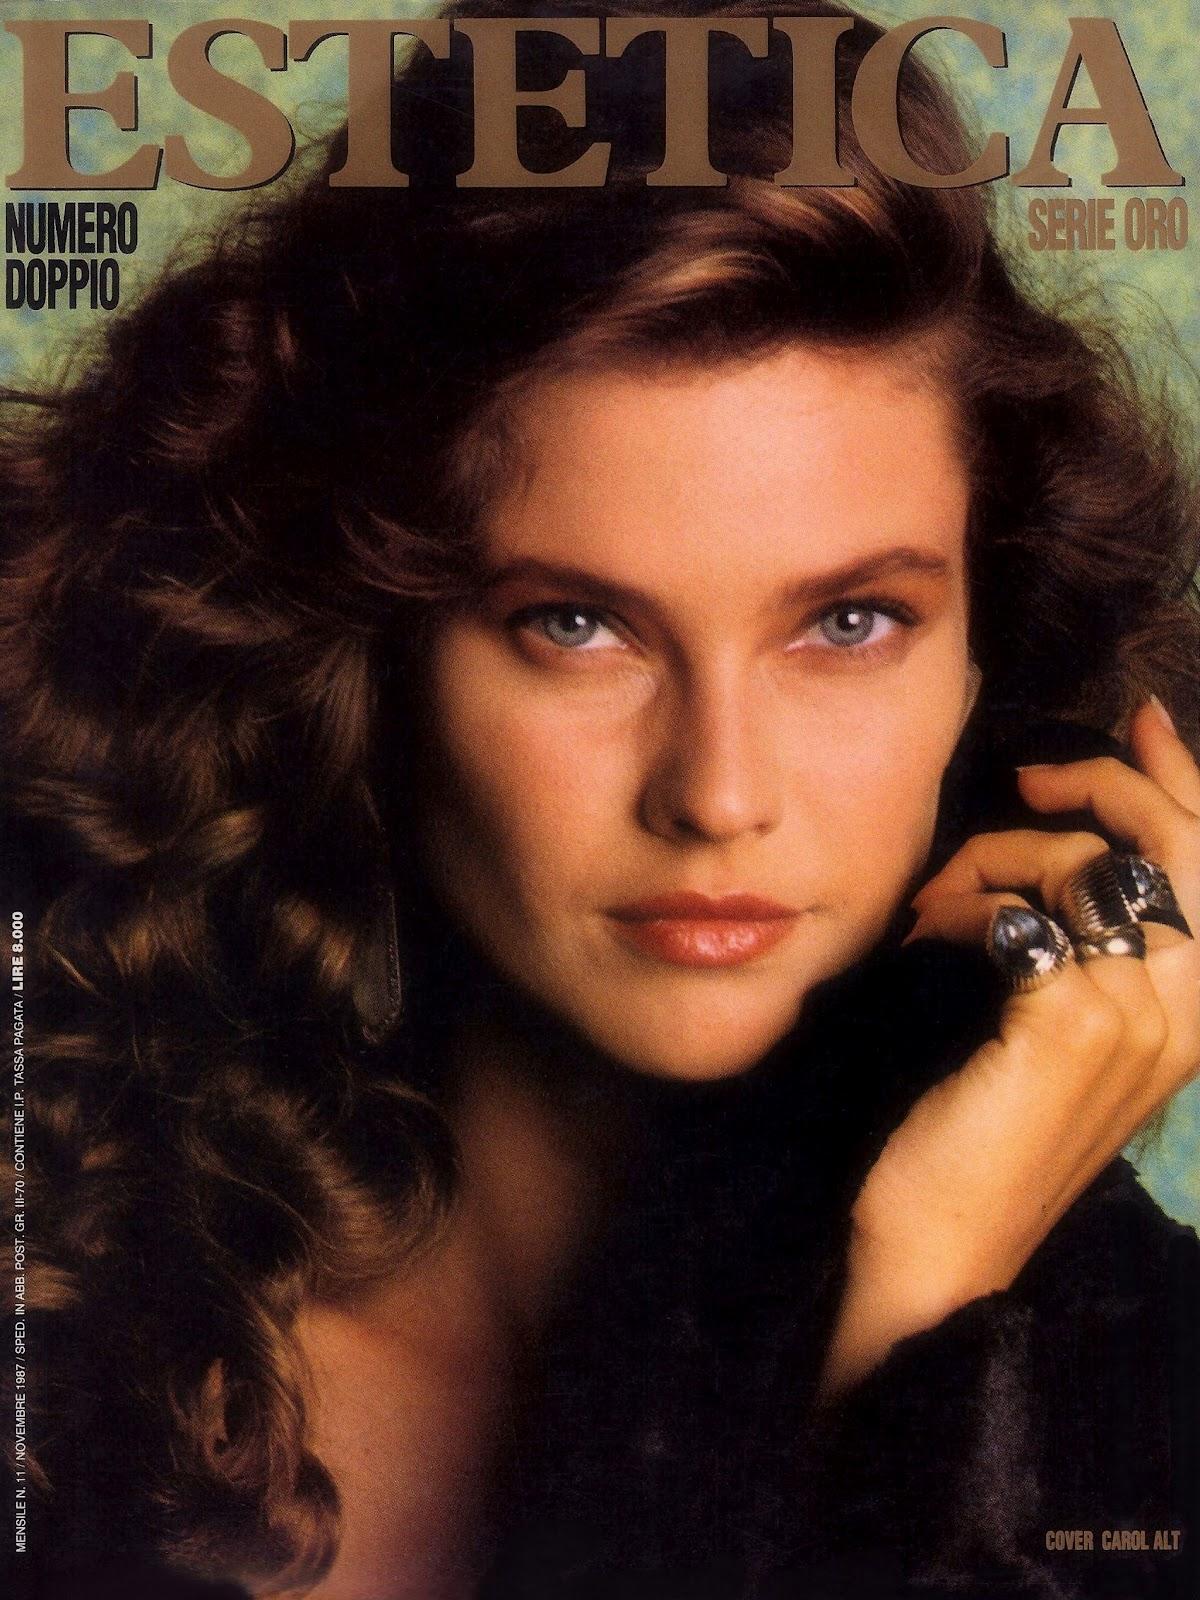 Yolanda Foster Modeling Photos 1980s Top models of the world: 1987